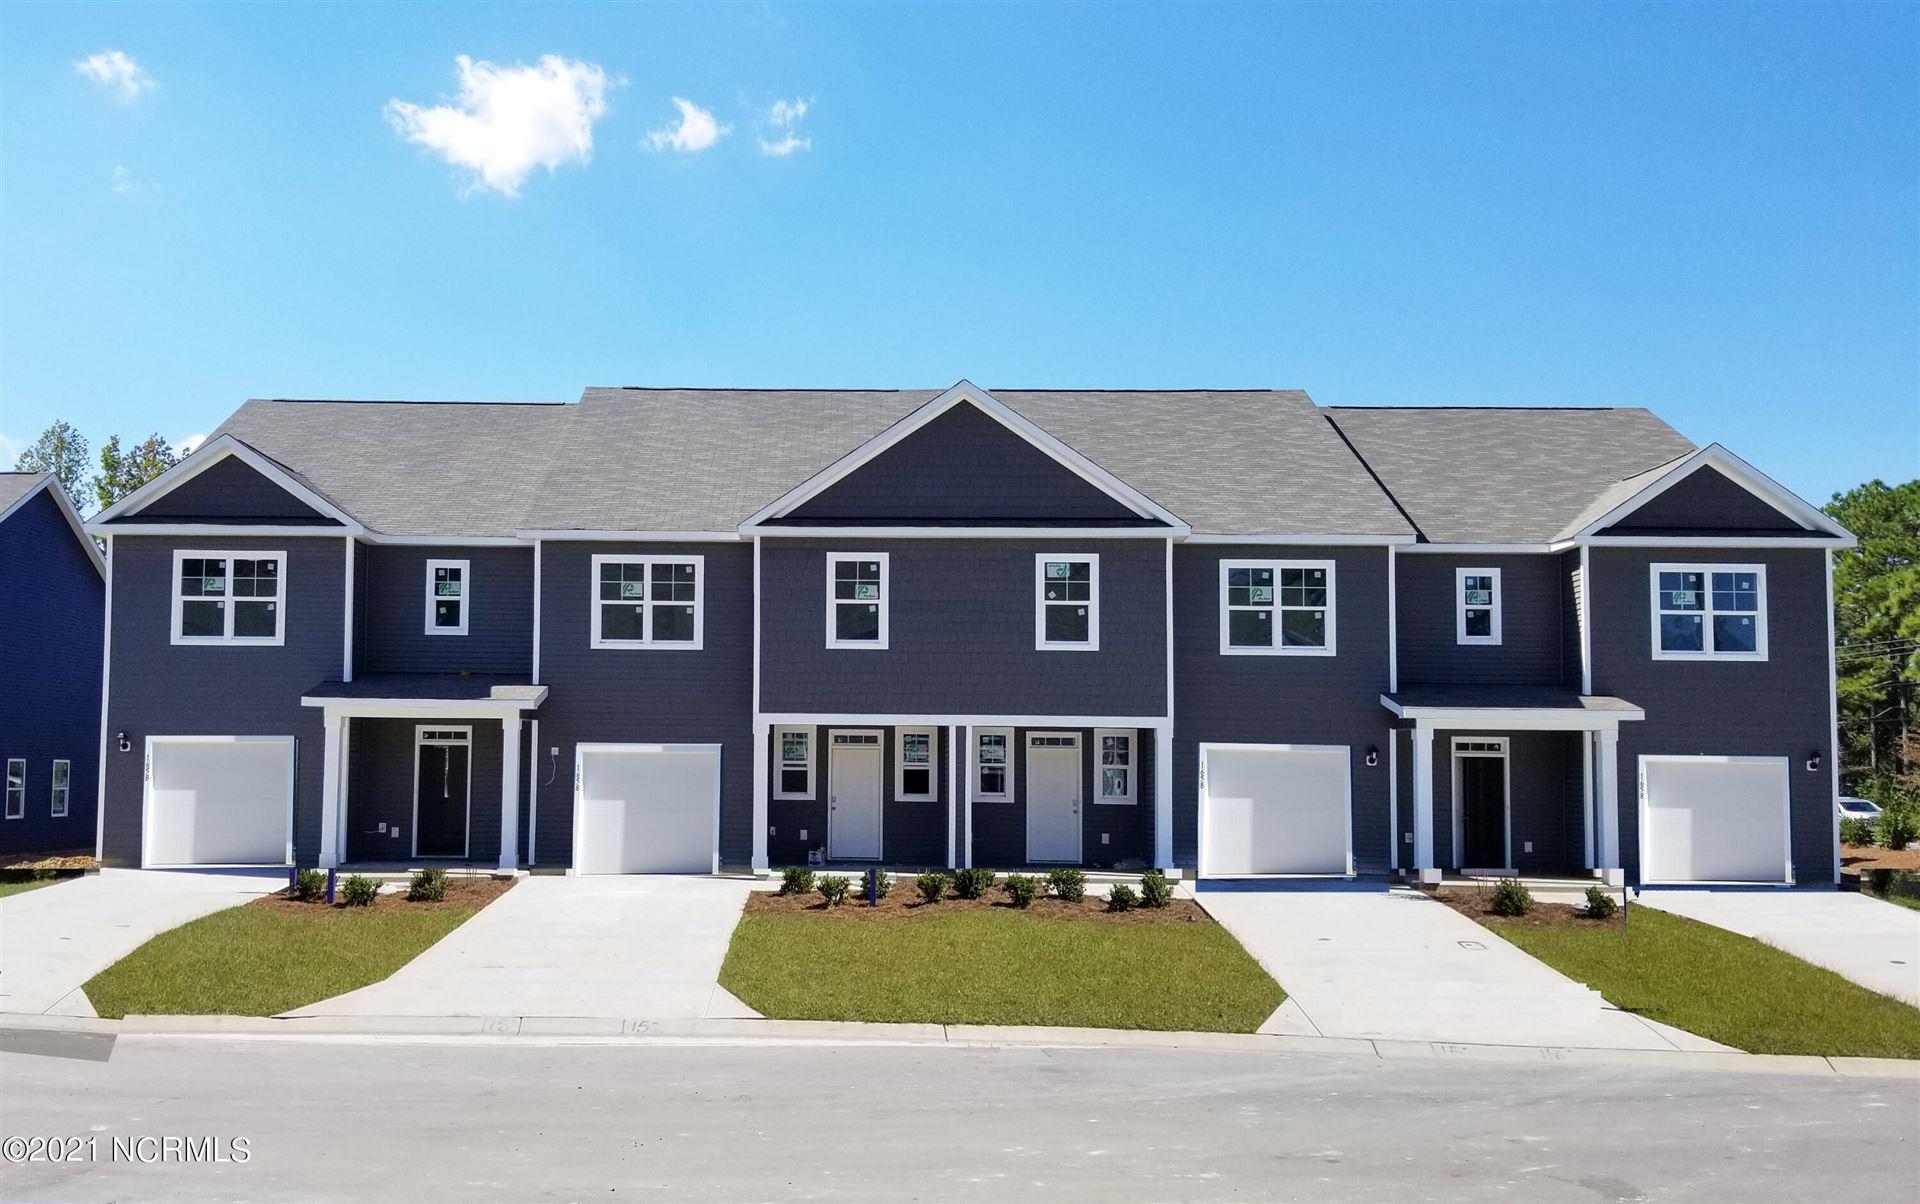 Photo of 1659 Killdeer Lane #Lot 2, Wilmington, NC 28411 (MLS # 100275070)